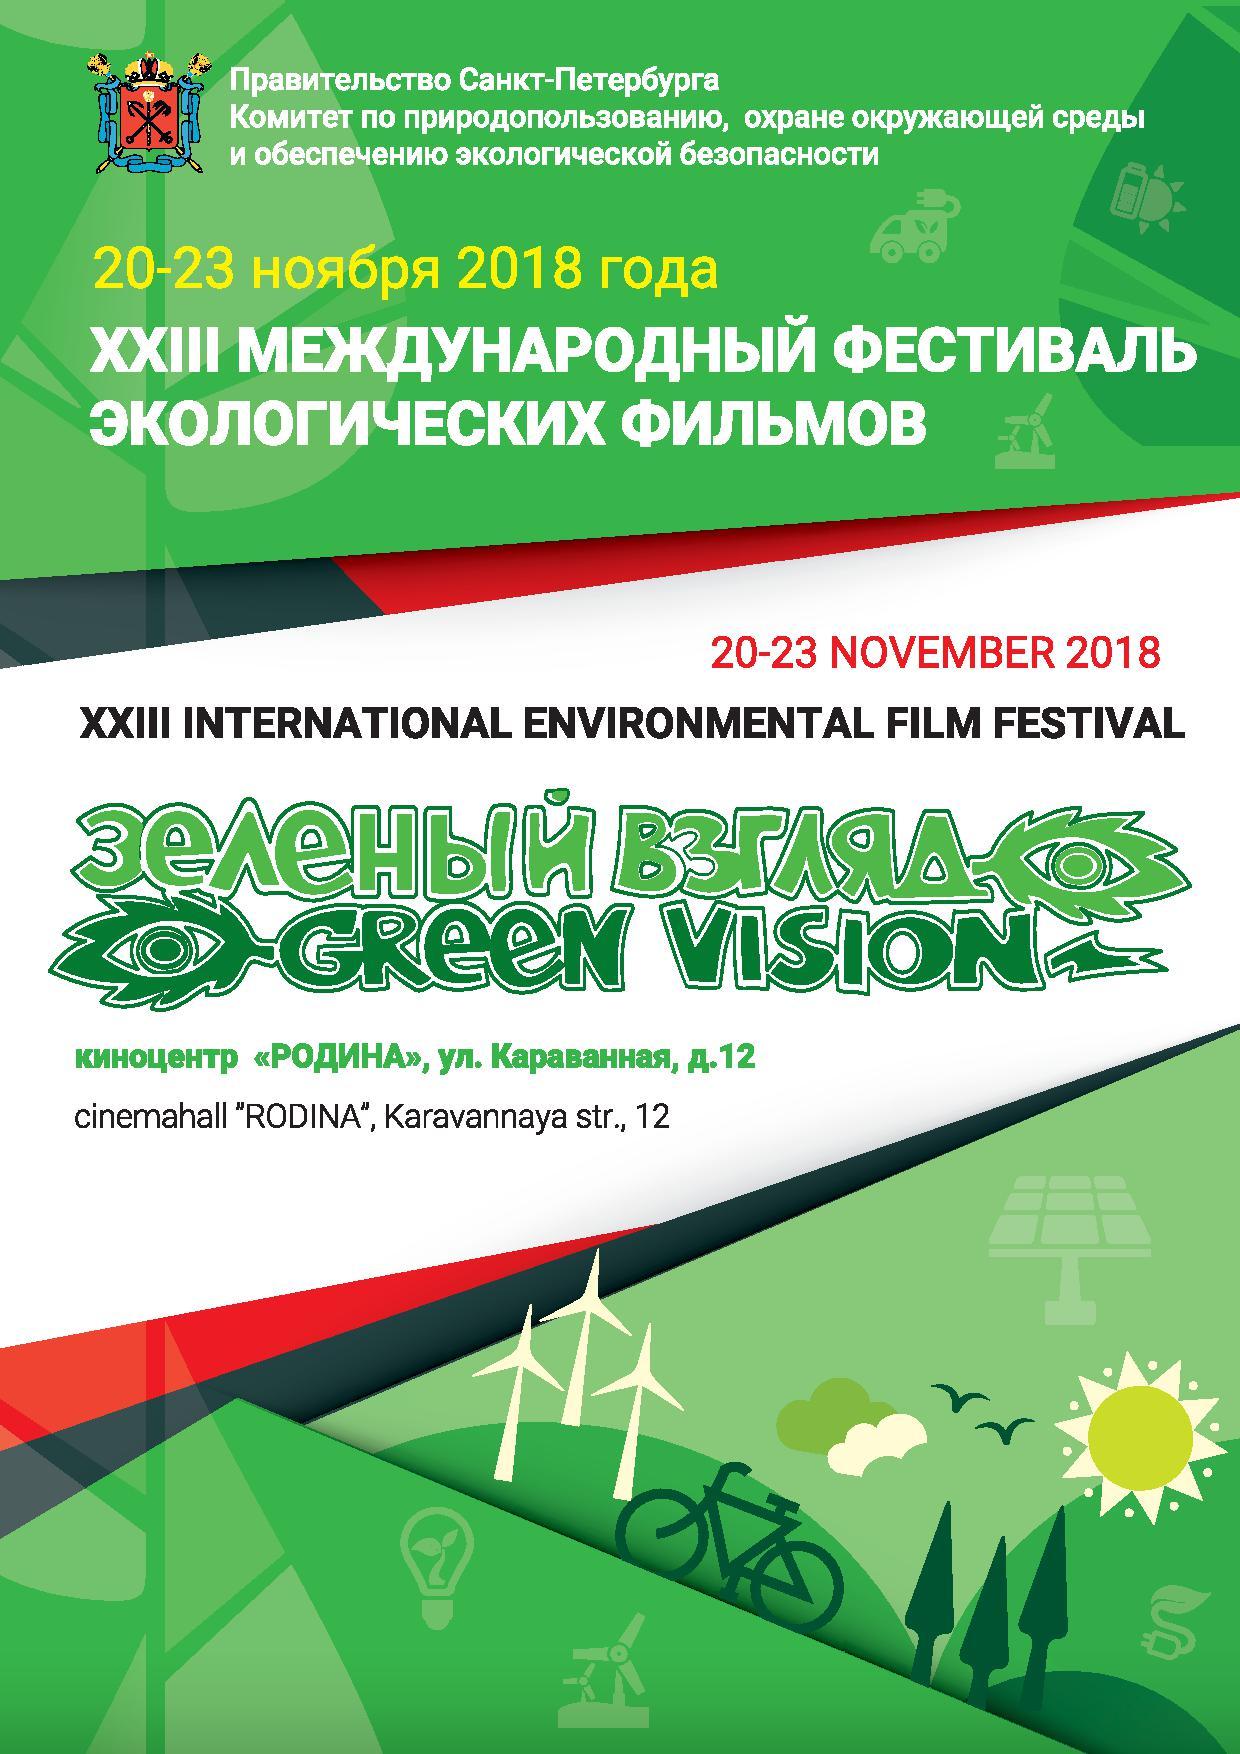 http://ecopeterburg.ru/wp-content/uploads/2018/08/GreenVision_2018_Afisha.jpg